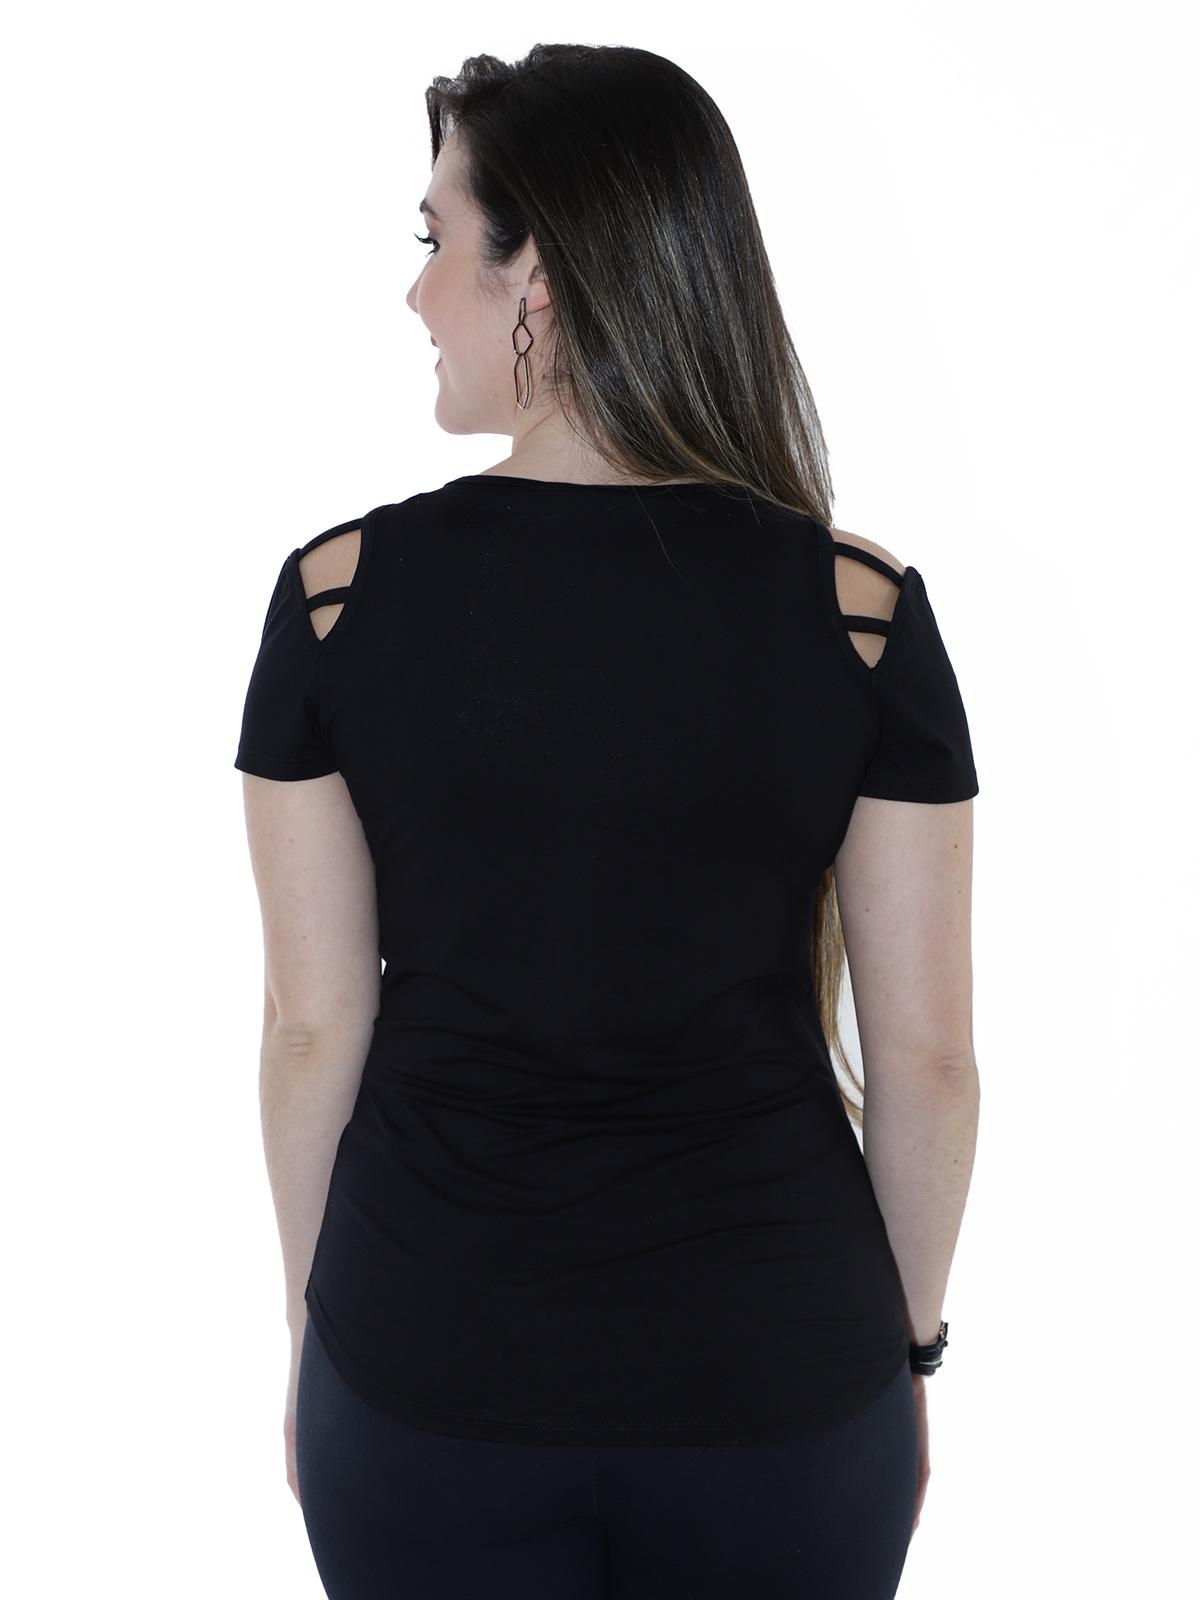 Blusa Feminina Longuete Ombro Diferenciado Anistia Preta